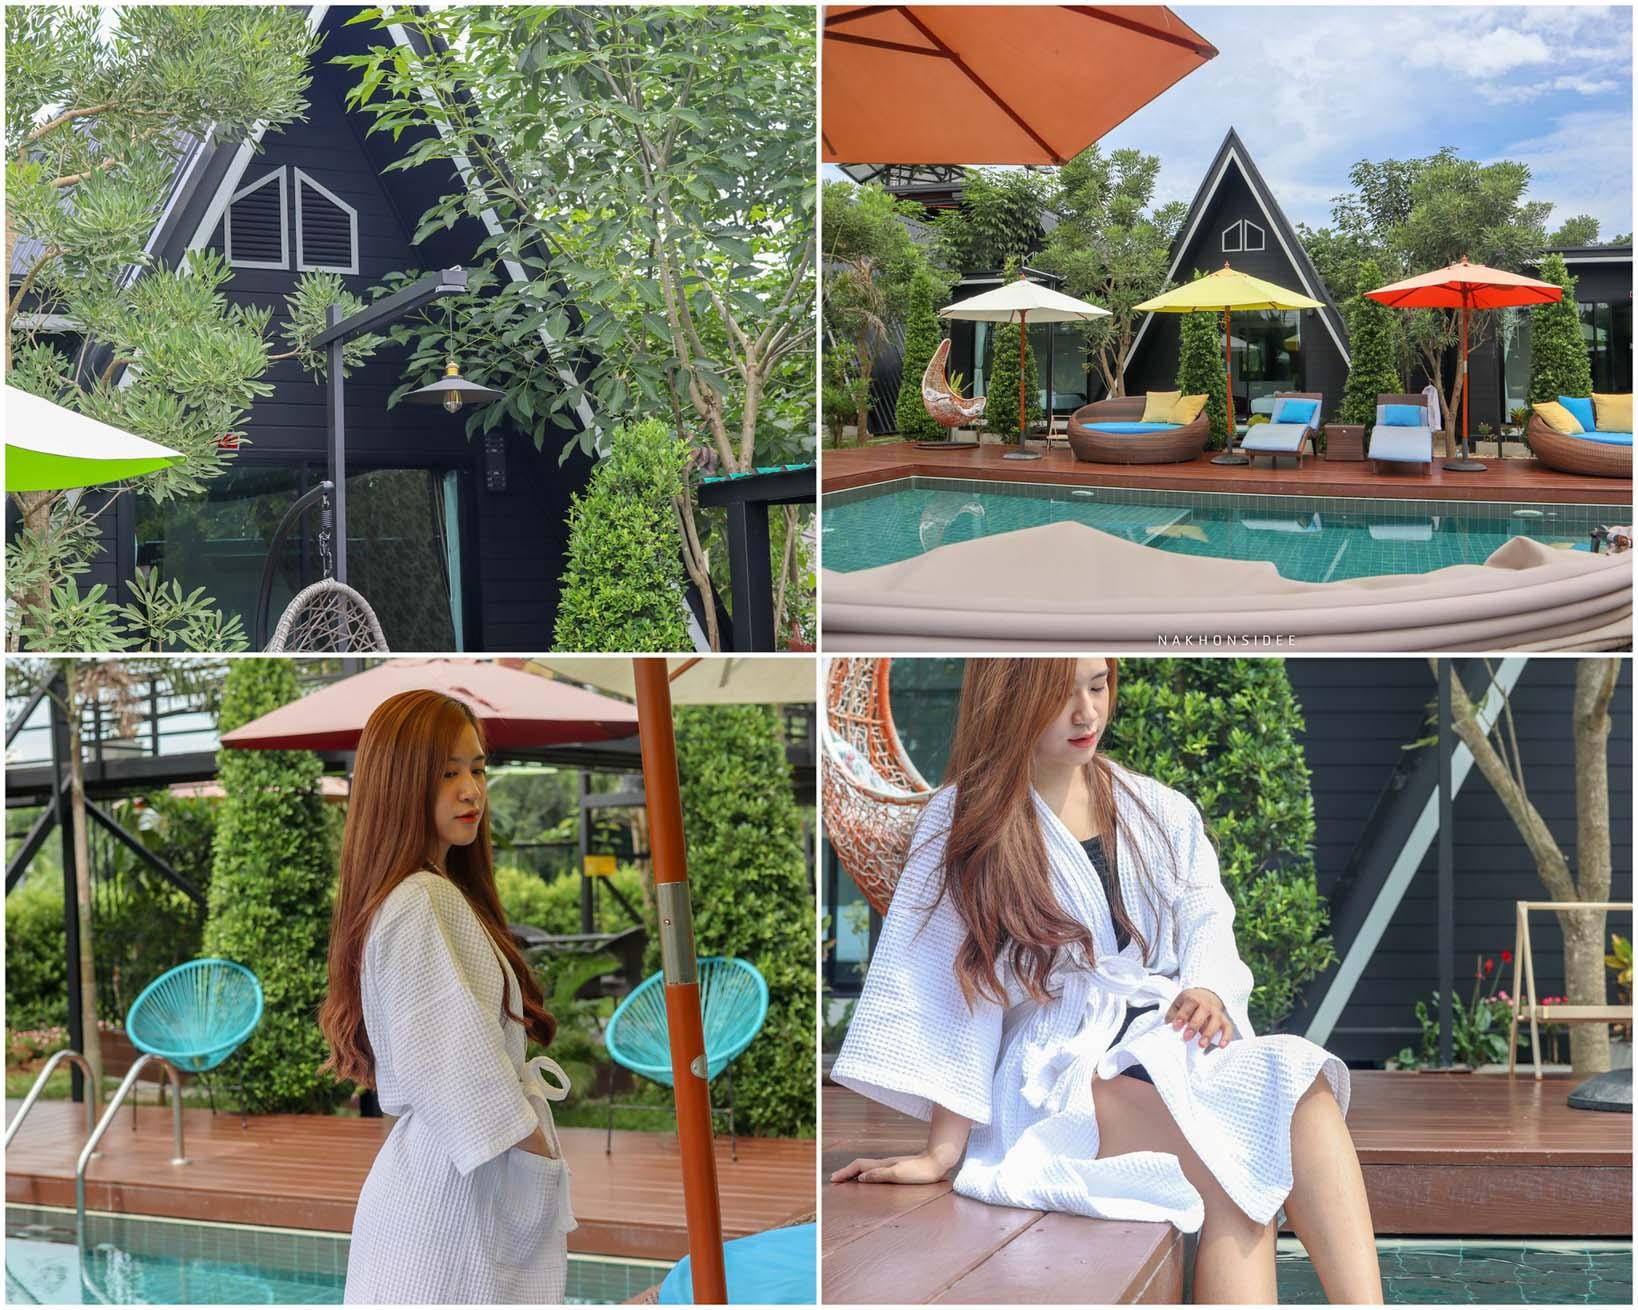 3.-Supanan-Resort-รีสอร์ทเปิดใหม่ล่าสุด-2020-บรรยากาศสบาย-มีห้องพักสวยๆวิวสระน้ำ-ห้องพักสวยหรูส่วนตัวมากครับ ที่เที่ยว,ที่พัก,พัทลุง,การท่องเที่ยว,ประเทศไทย,วิถีชีวิต,ชุมชน,ดริฟท์กาแฟ